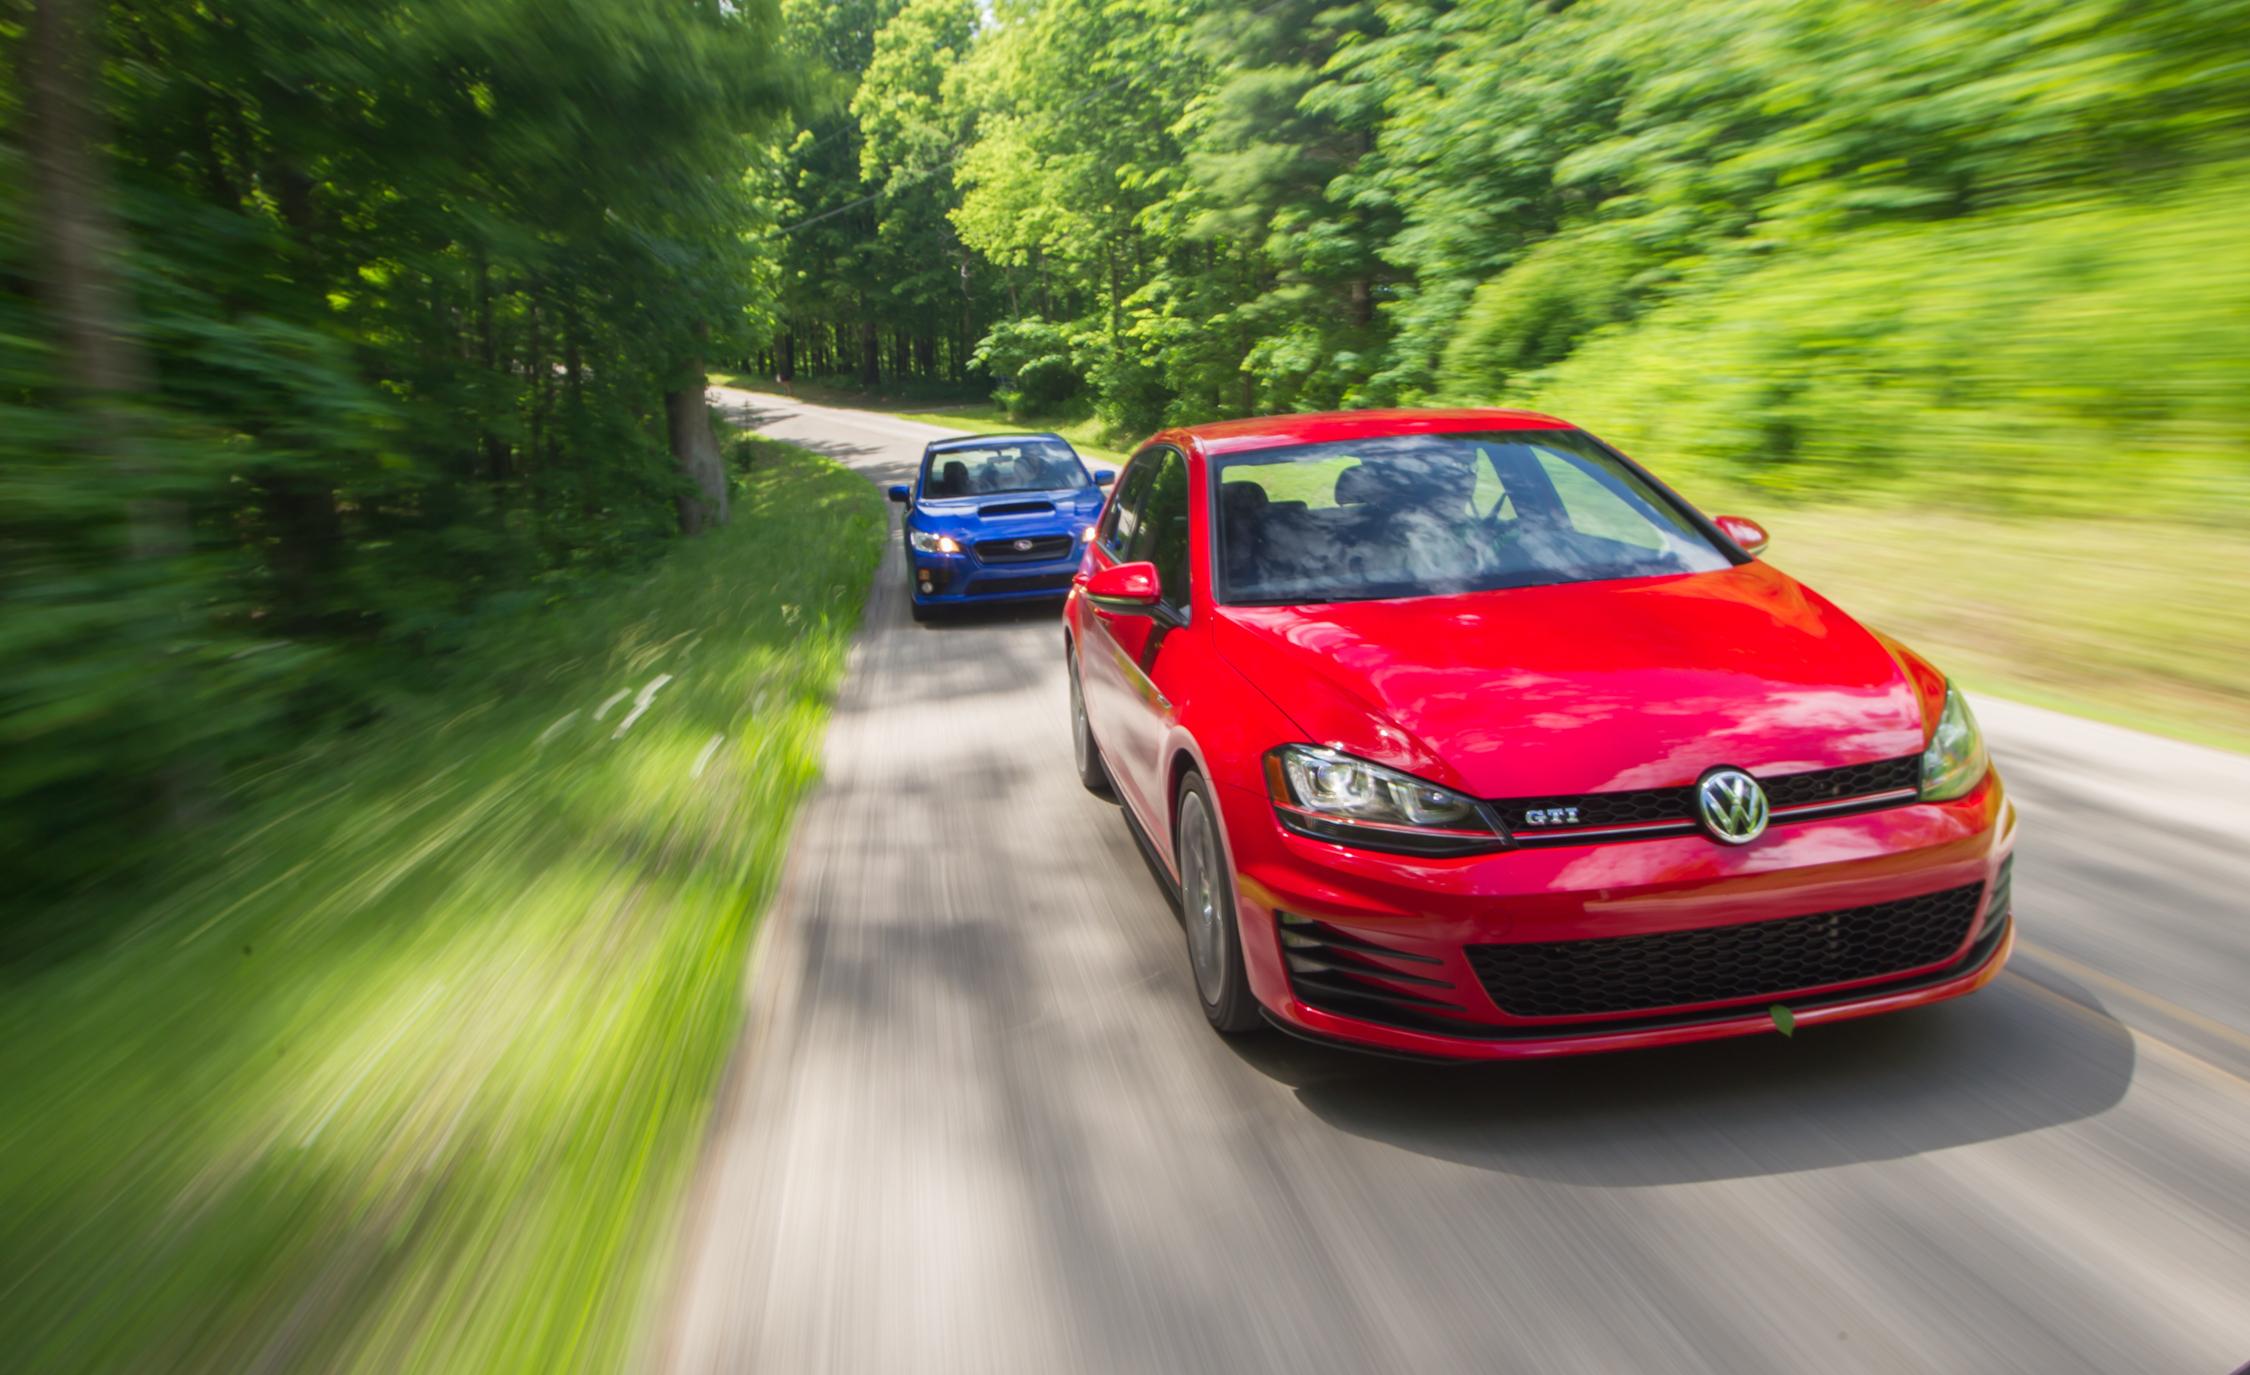 Front View 2015 Volkswagen GTI vs Subaru WRX